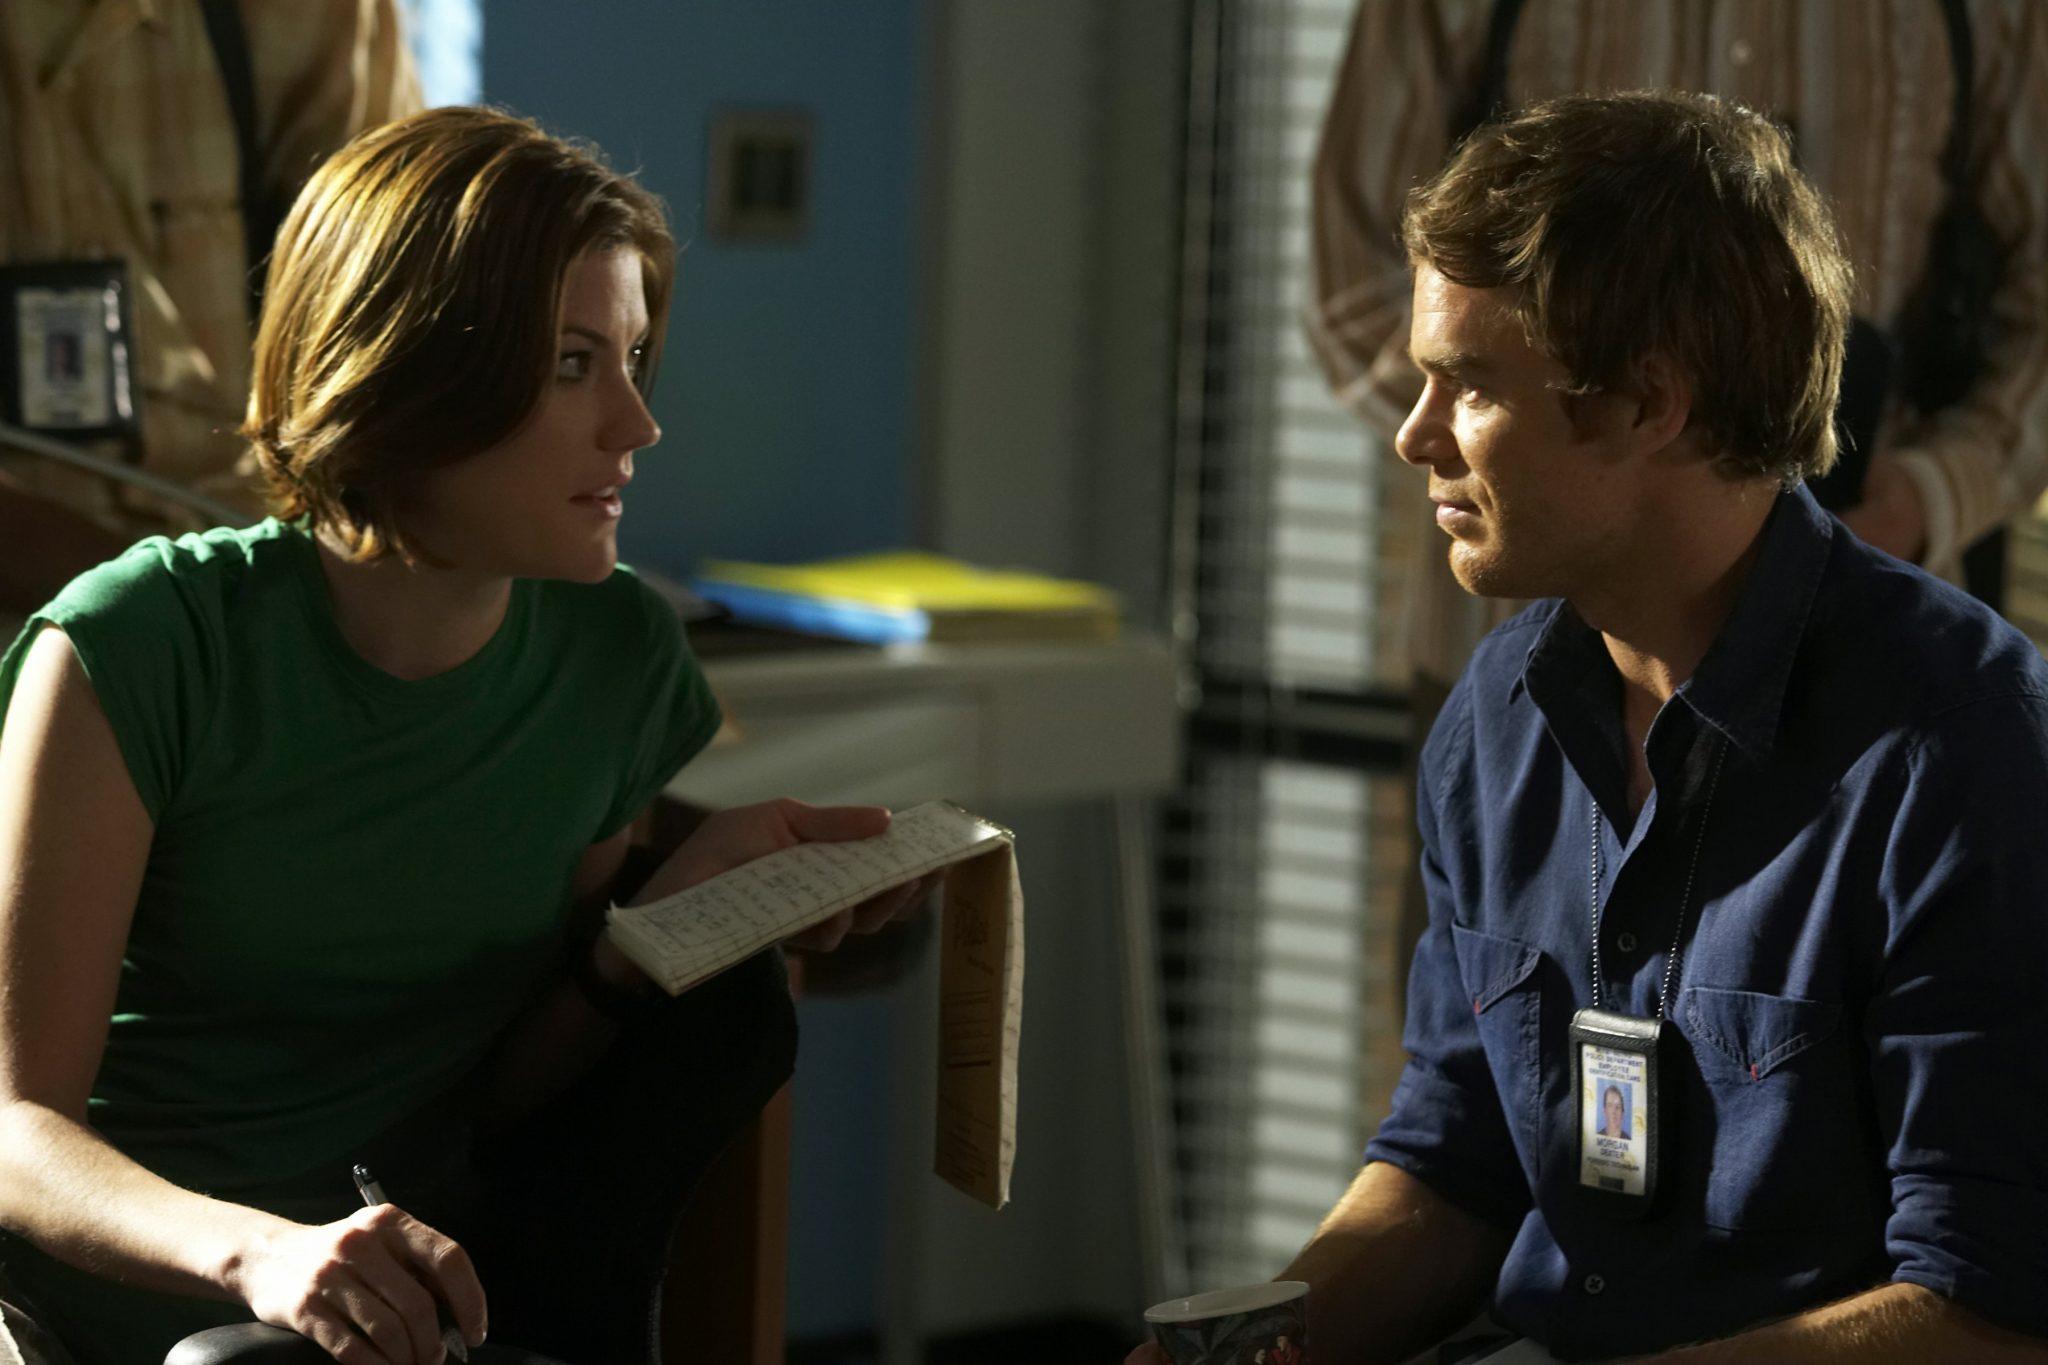 Debra Morgan und ihr Bruder Dexter Morgan in Dexter